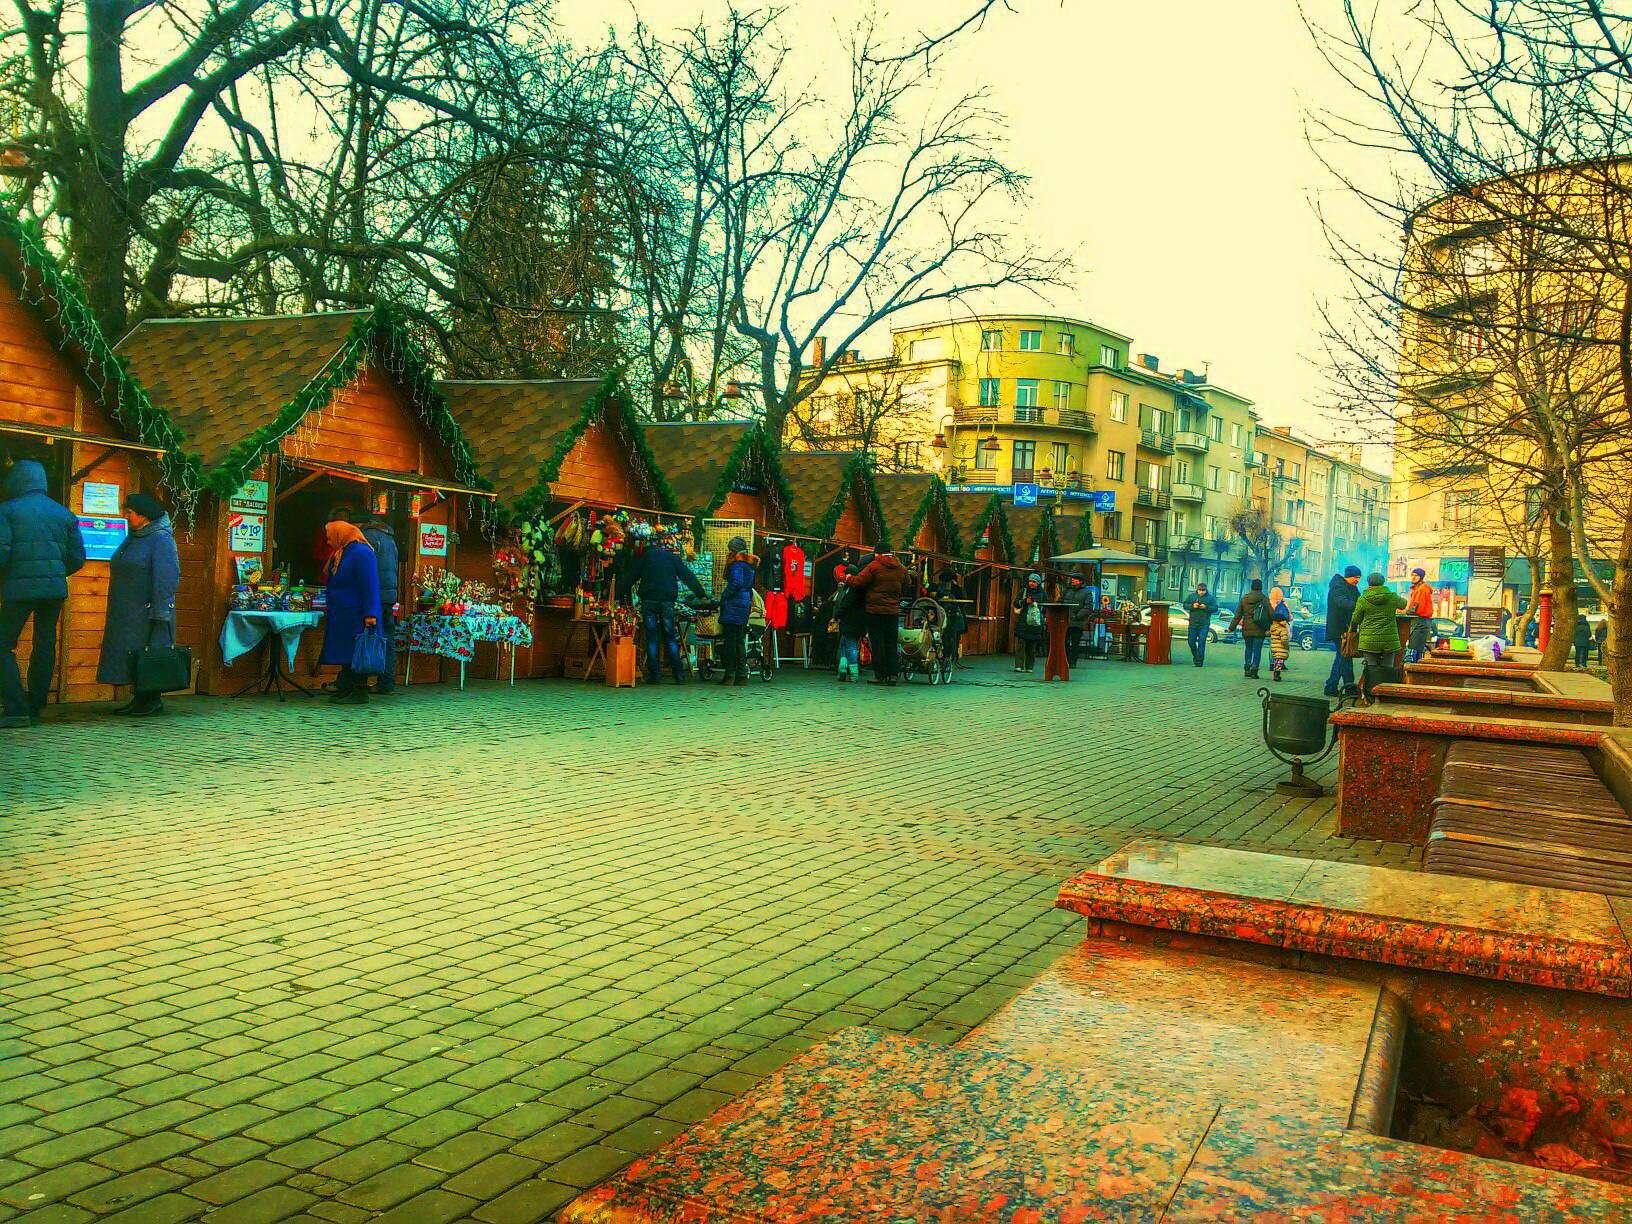 Центральна частина міста Івано-Франківськ